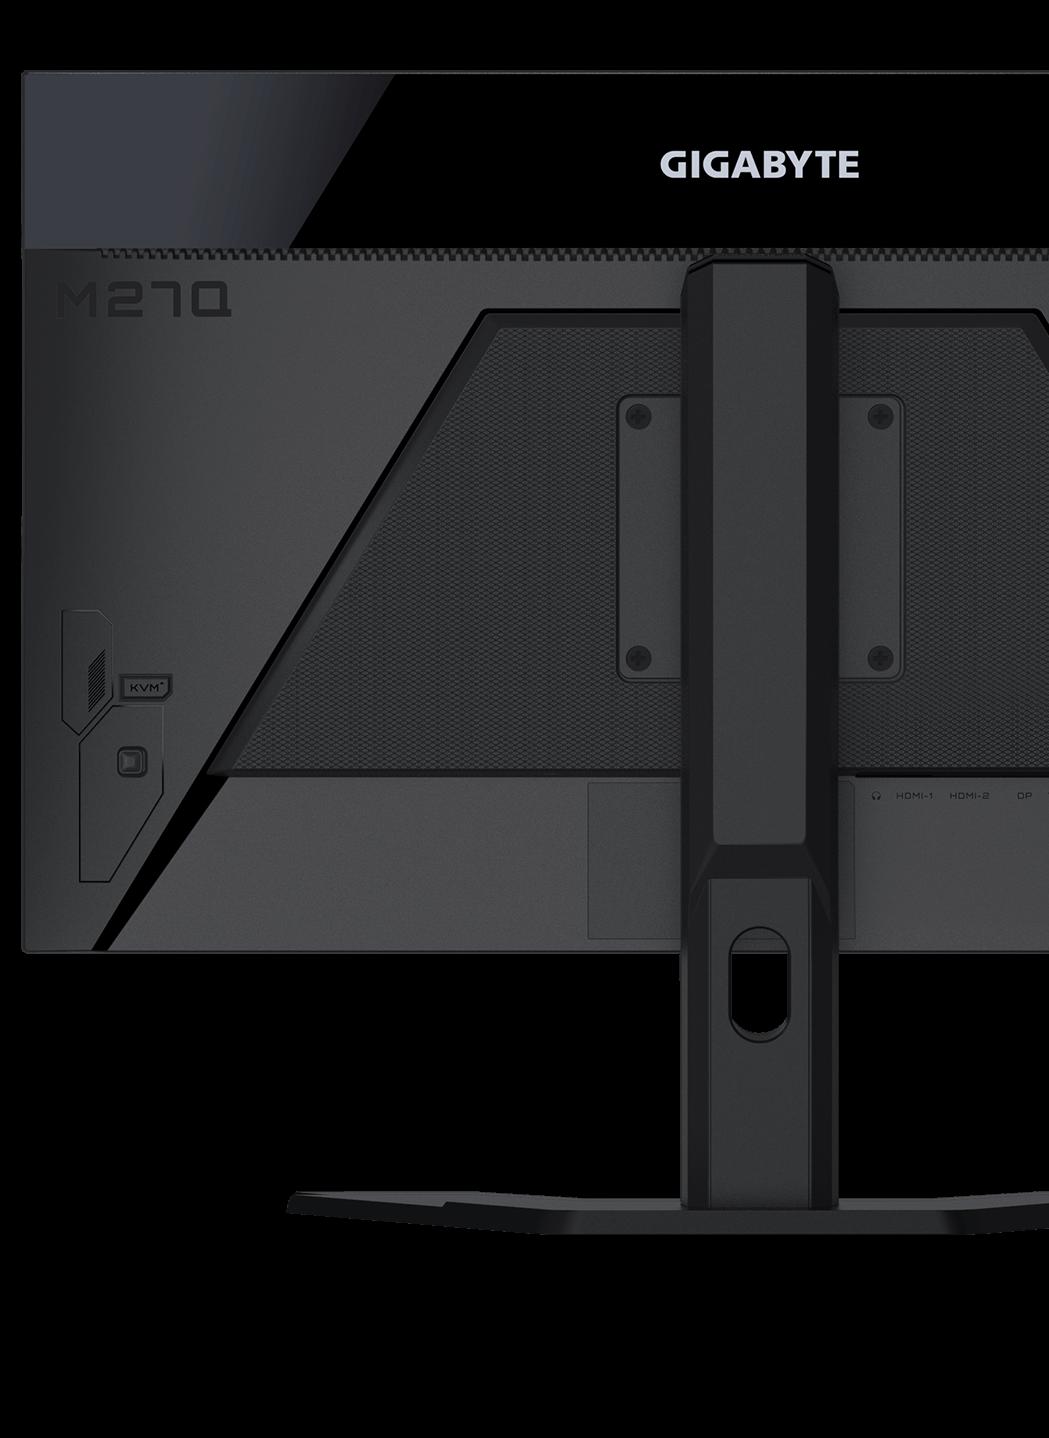 Gigabyte M27Q Gaming Monitor QHD 170Hz 0.5ms IPS 12